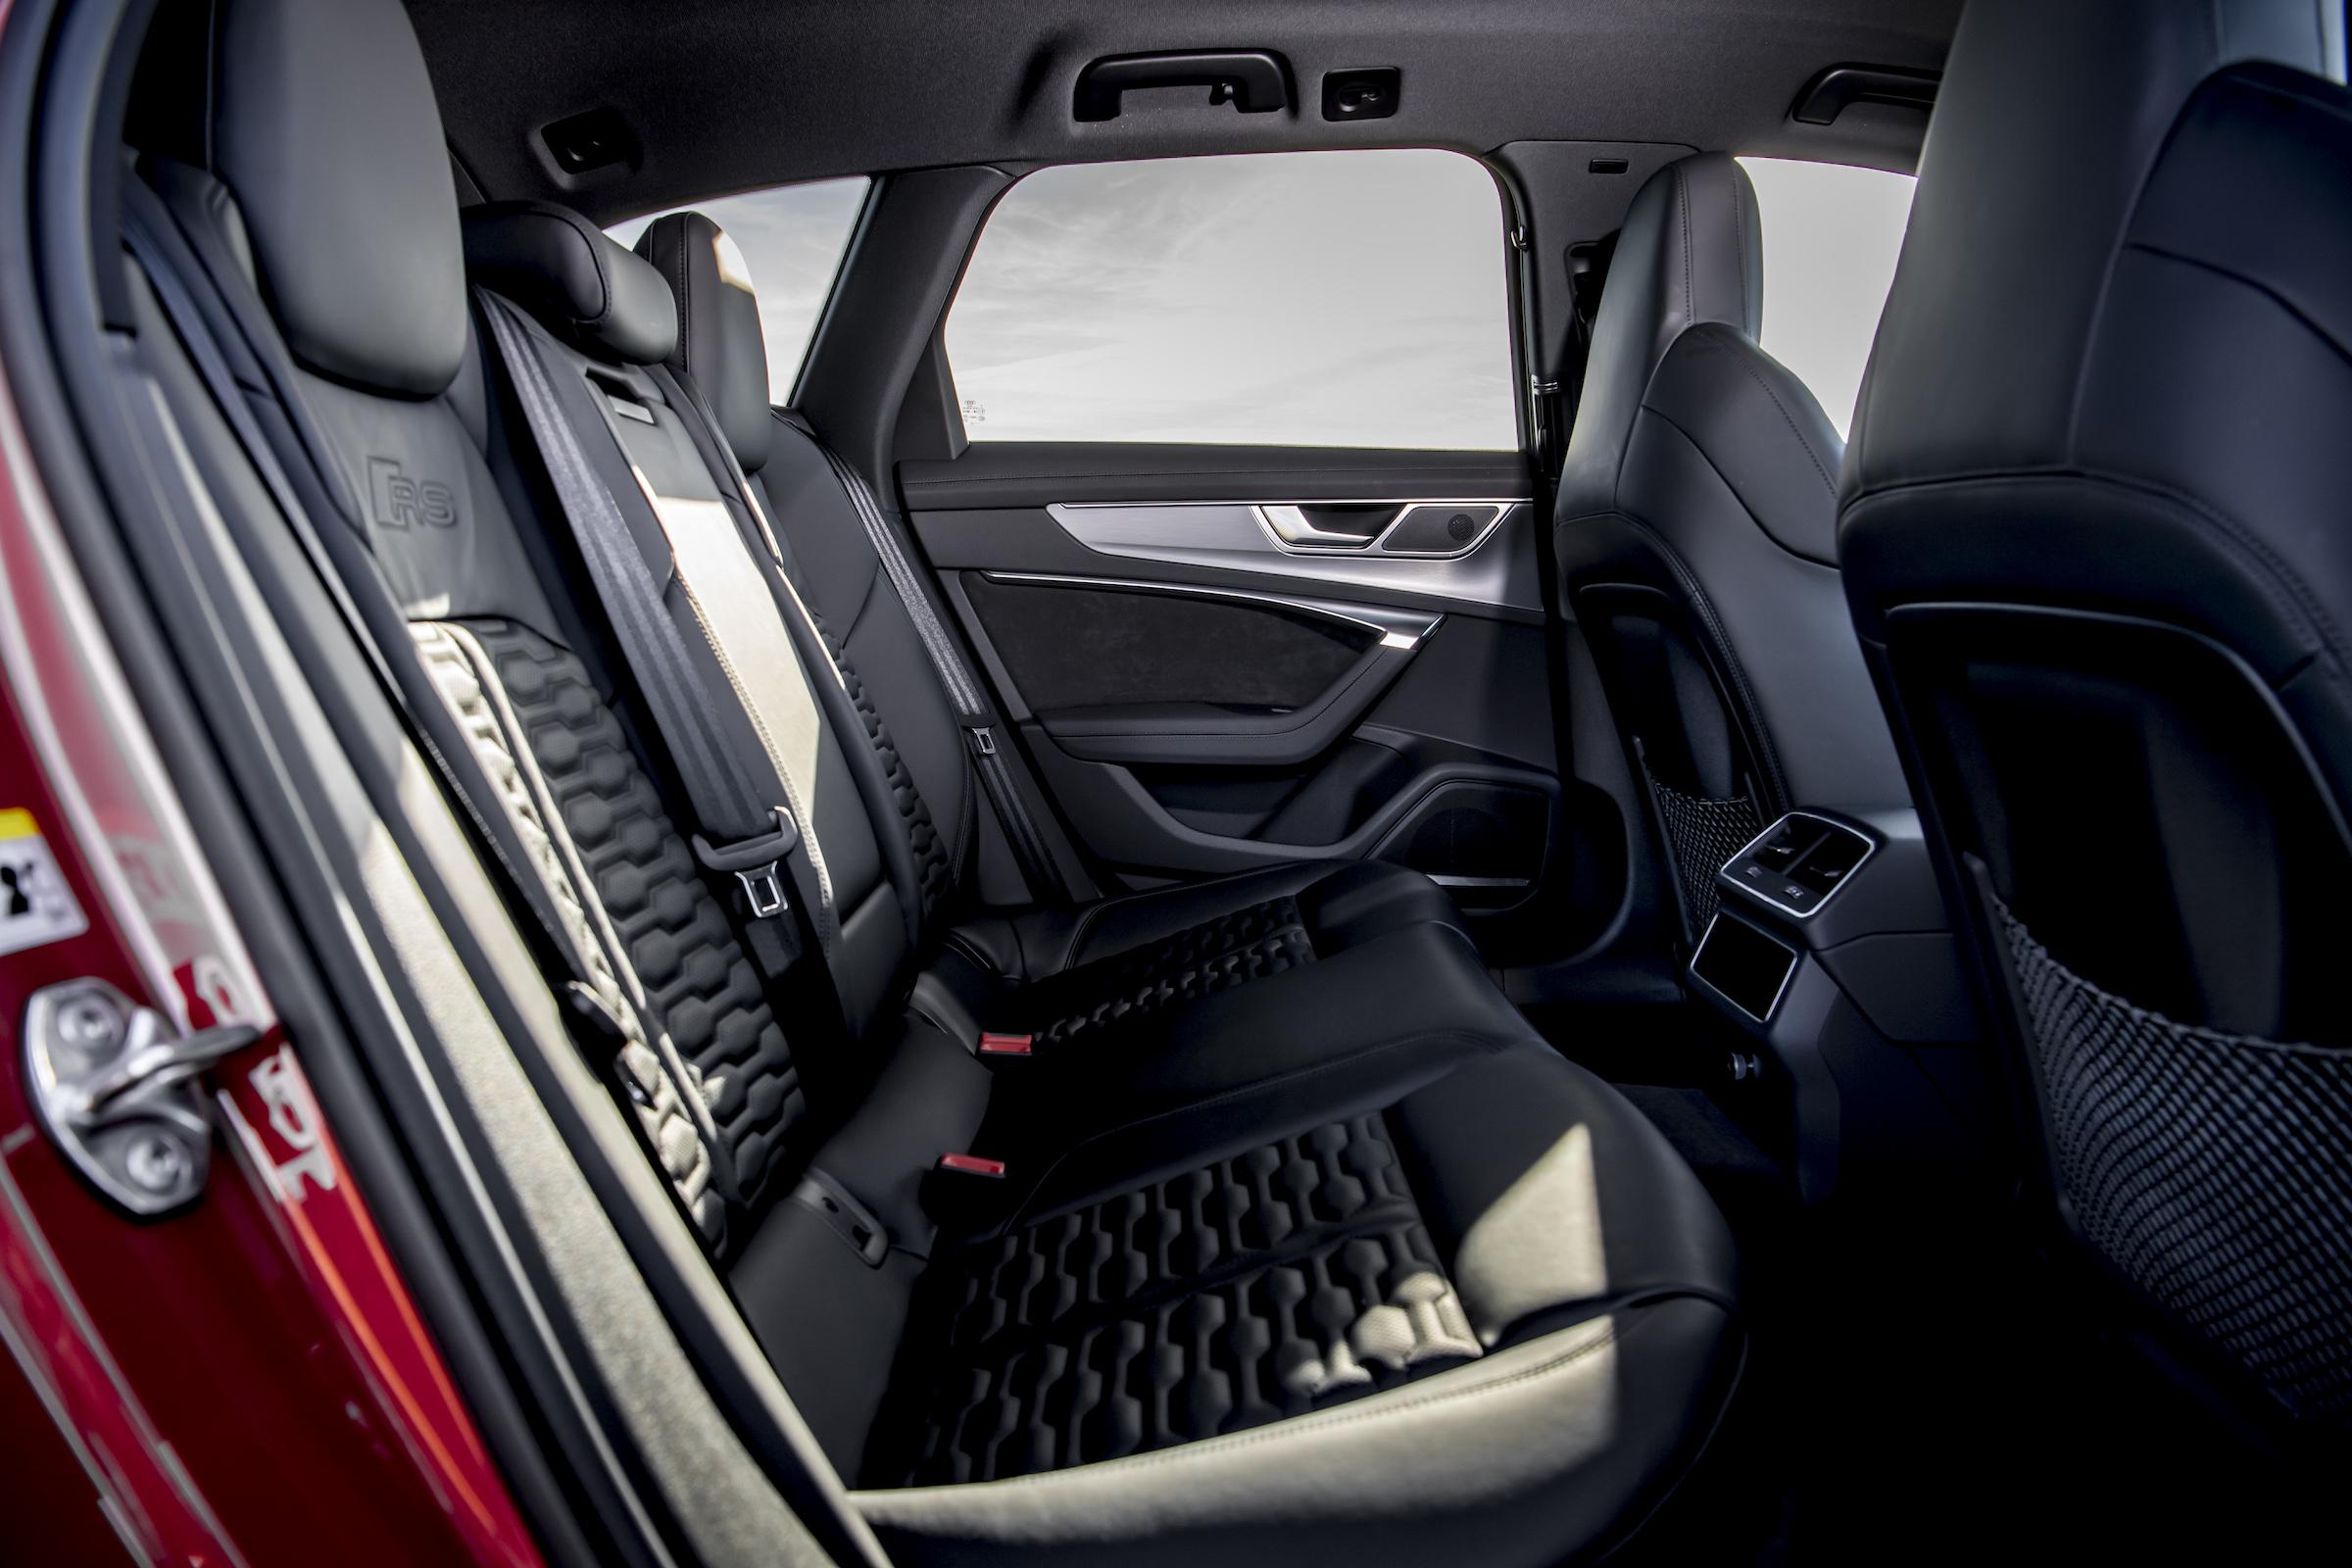 Audi RS6 interior rear seat